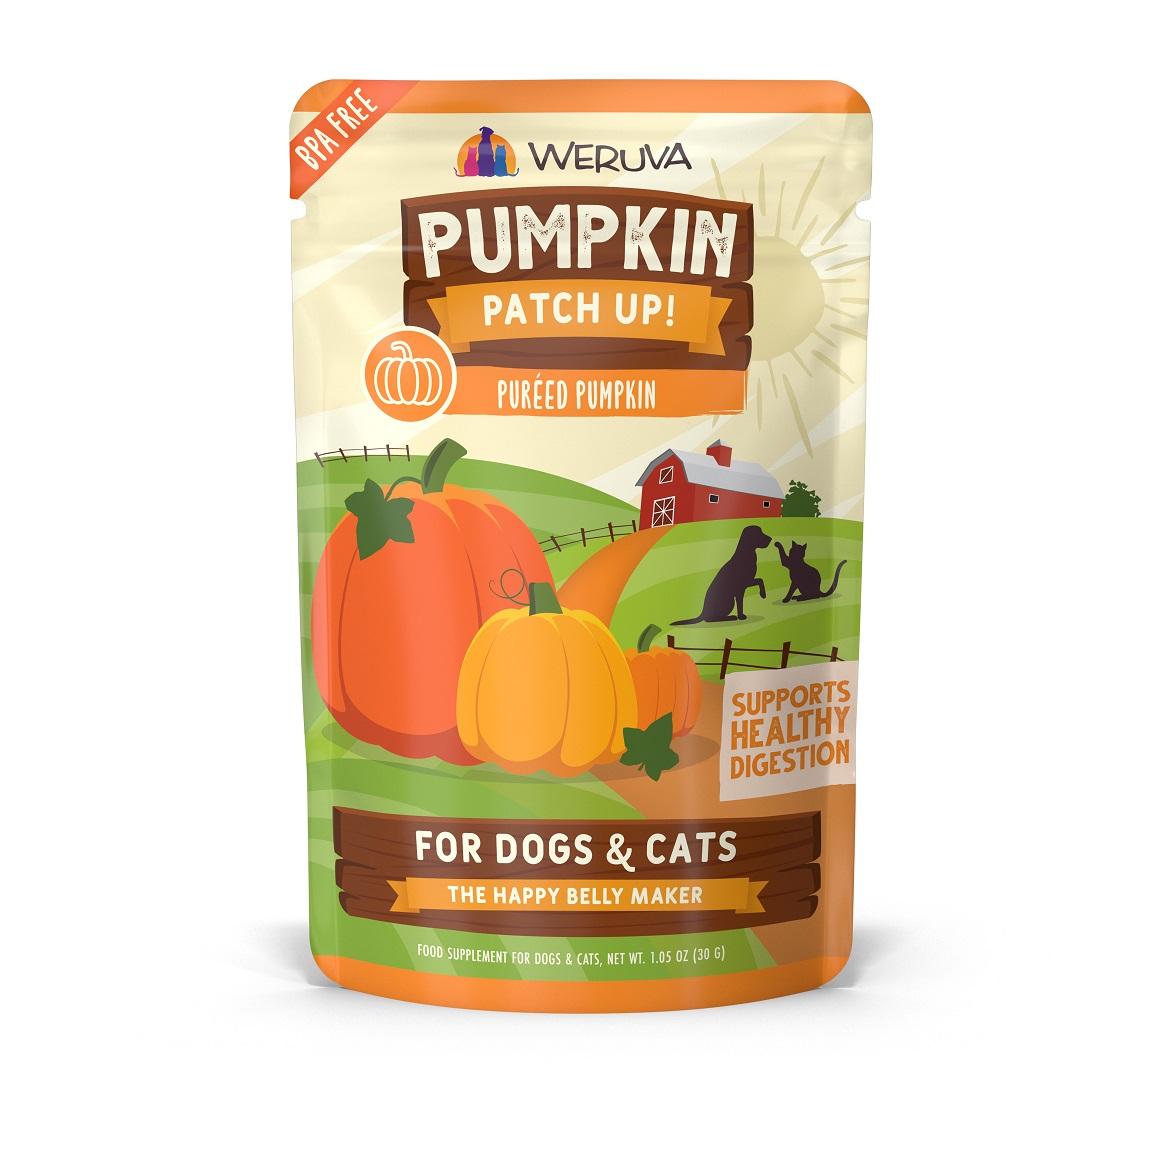 Weruva Pumpkin Patch Up! Dog & Cat Food Supplement Image